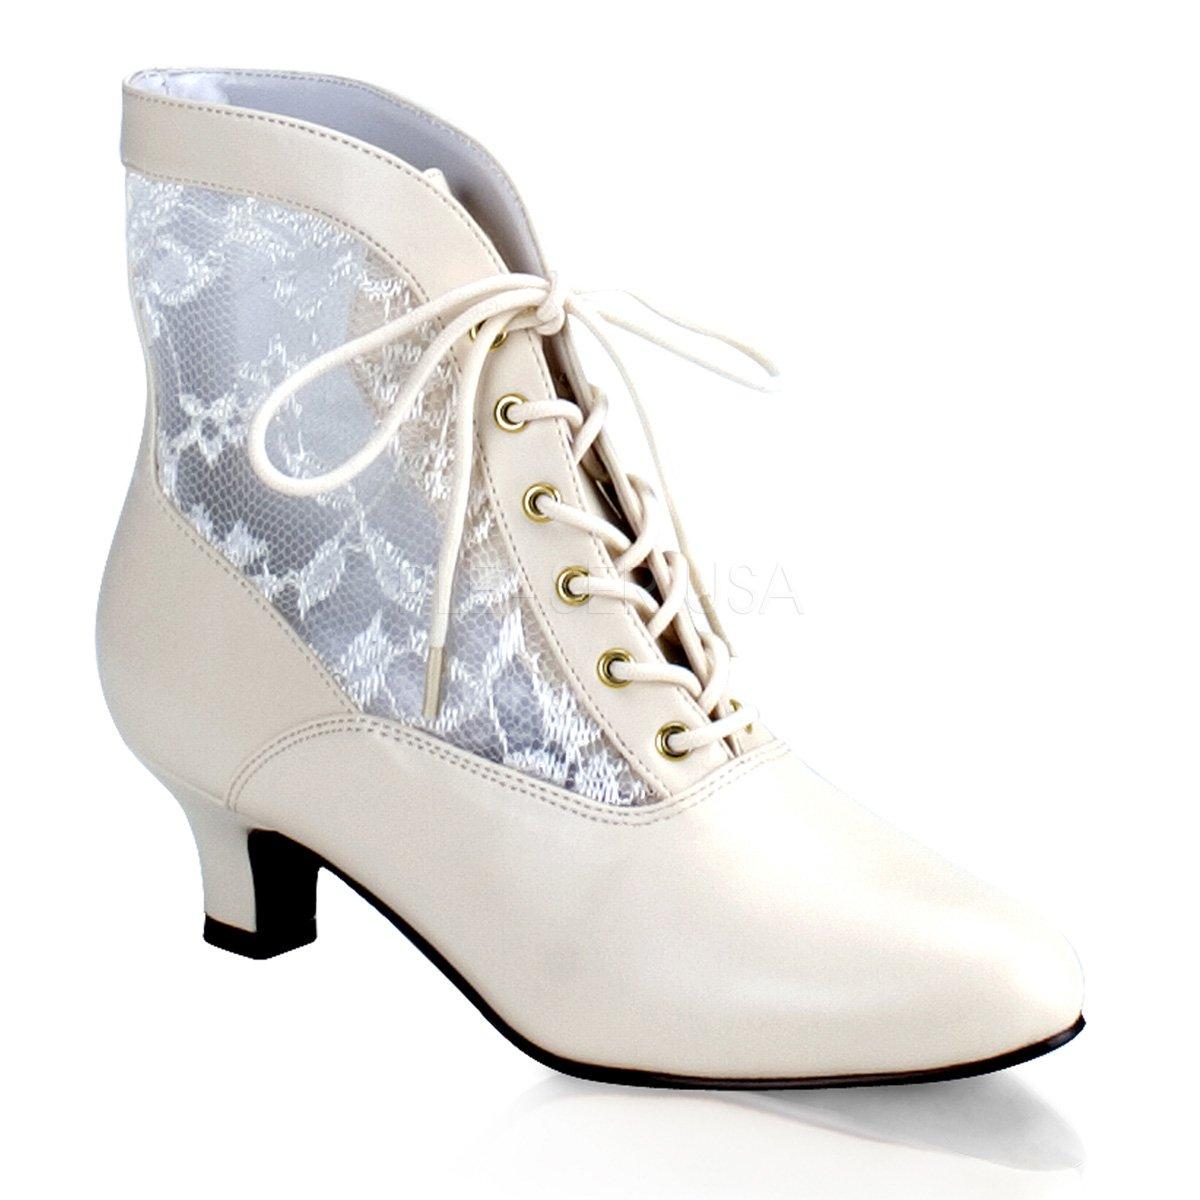 Funtasma Schuhe für Grand Dames: Dame-05 Kostümschuhe  38 EU Elfenbein